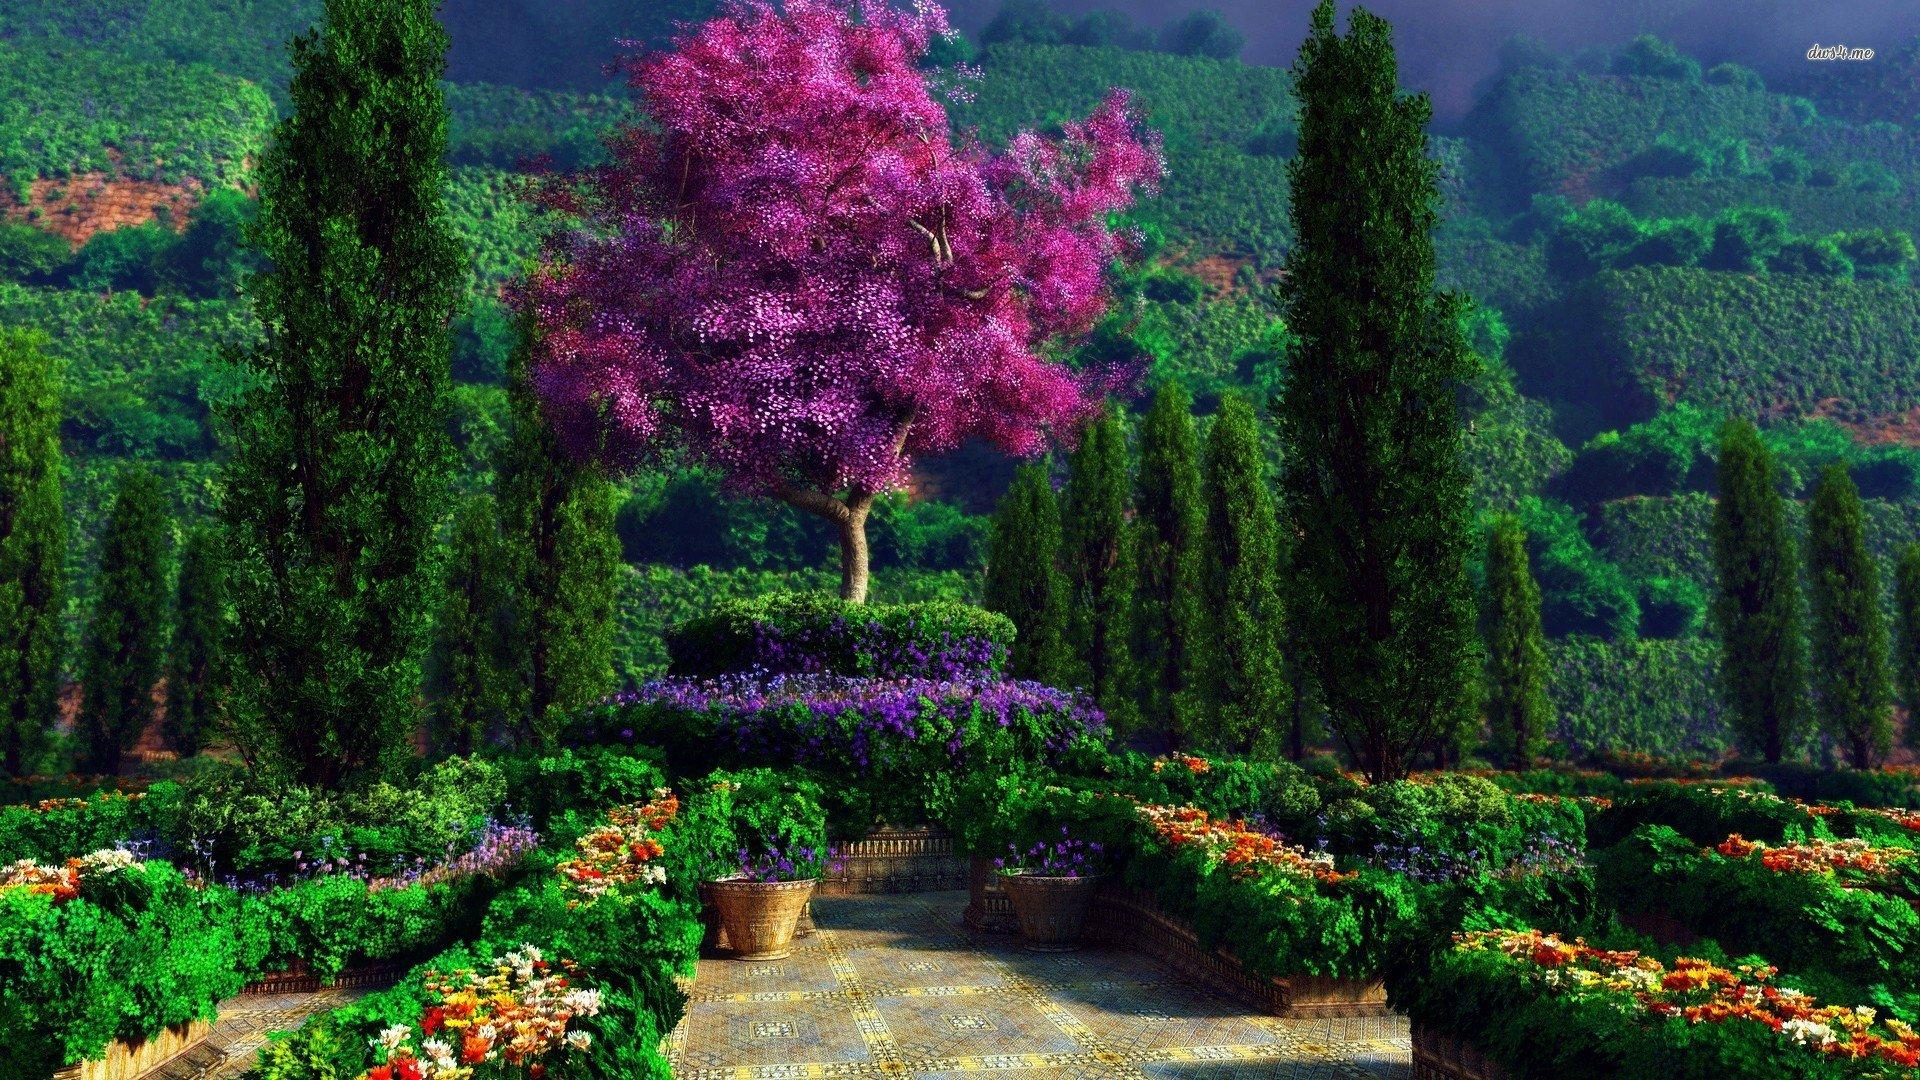 Garden wallpapers 1920x1080 Full HD 1080p desktop backgrounds 1920x1080